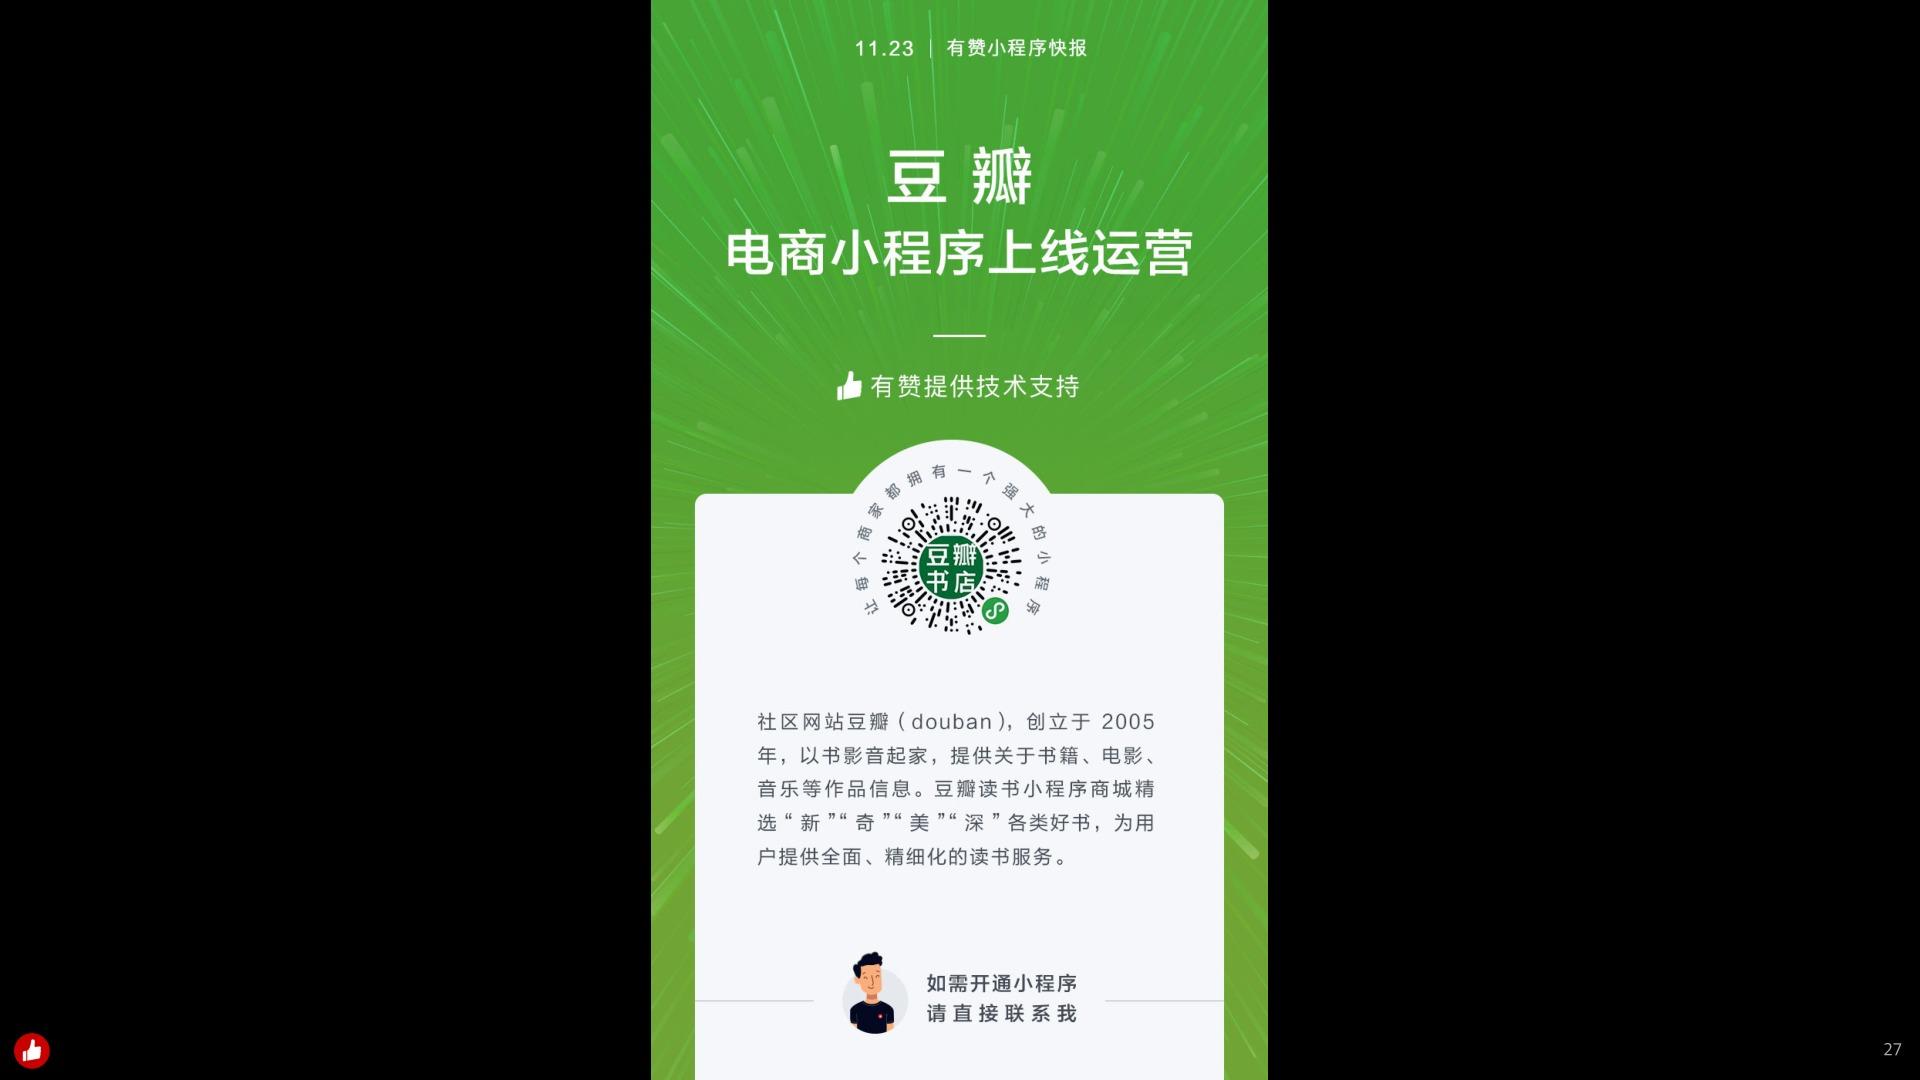 https://opentalk-blog.b0.upaiyun.com/prod/2018-11-26/3c29449099a3457cafedc1c21f6898d9